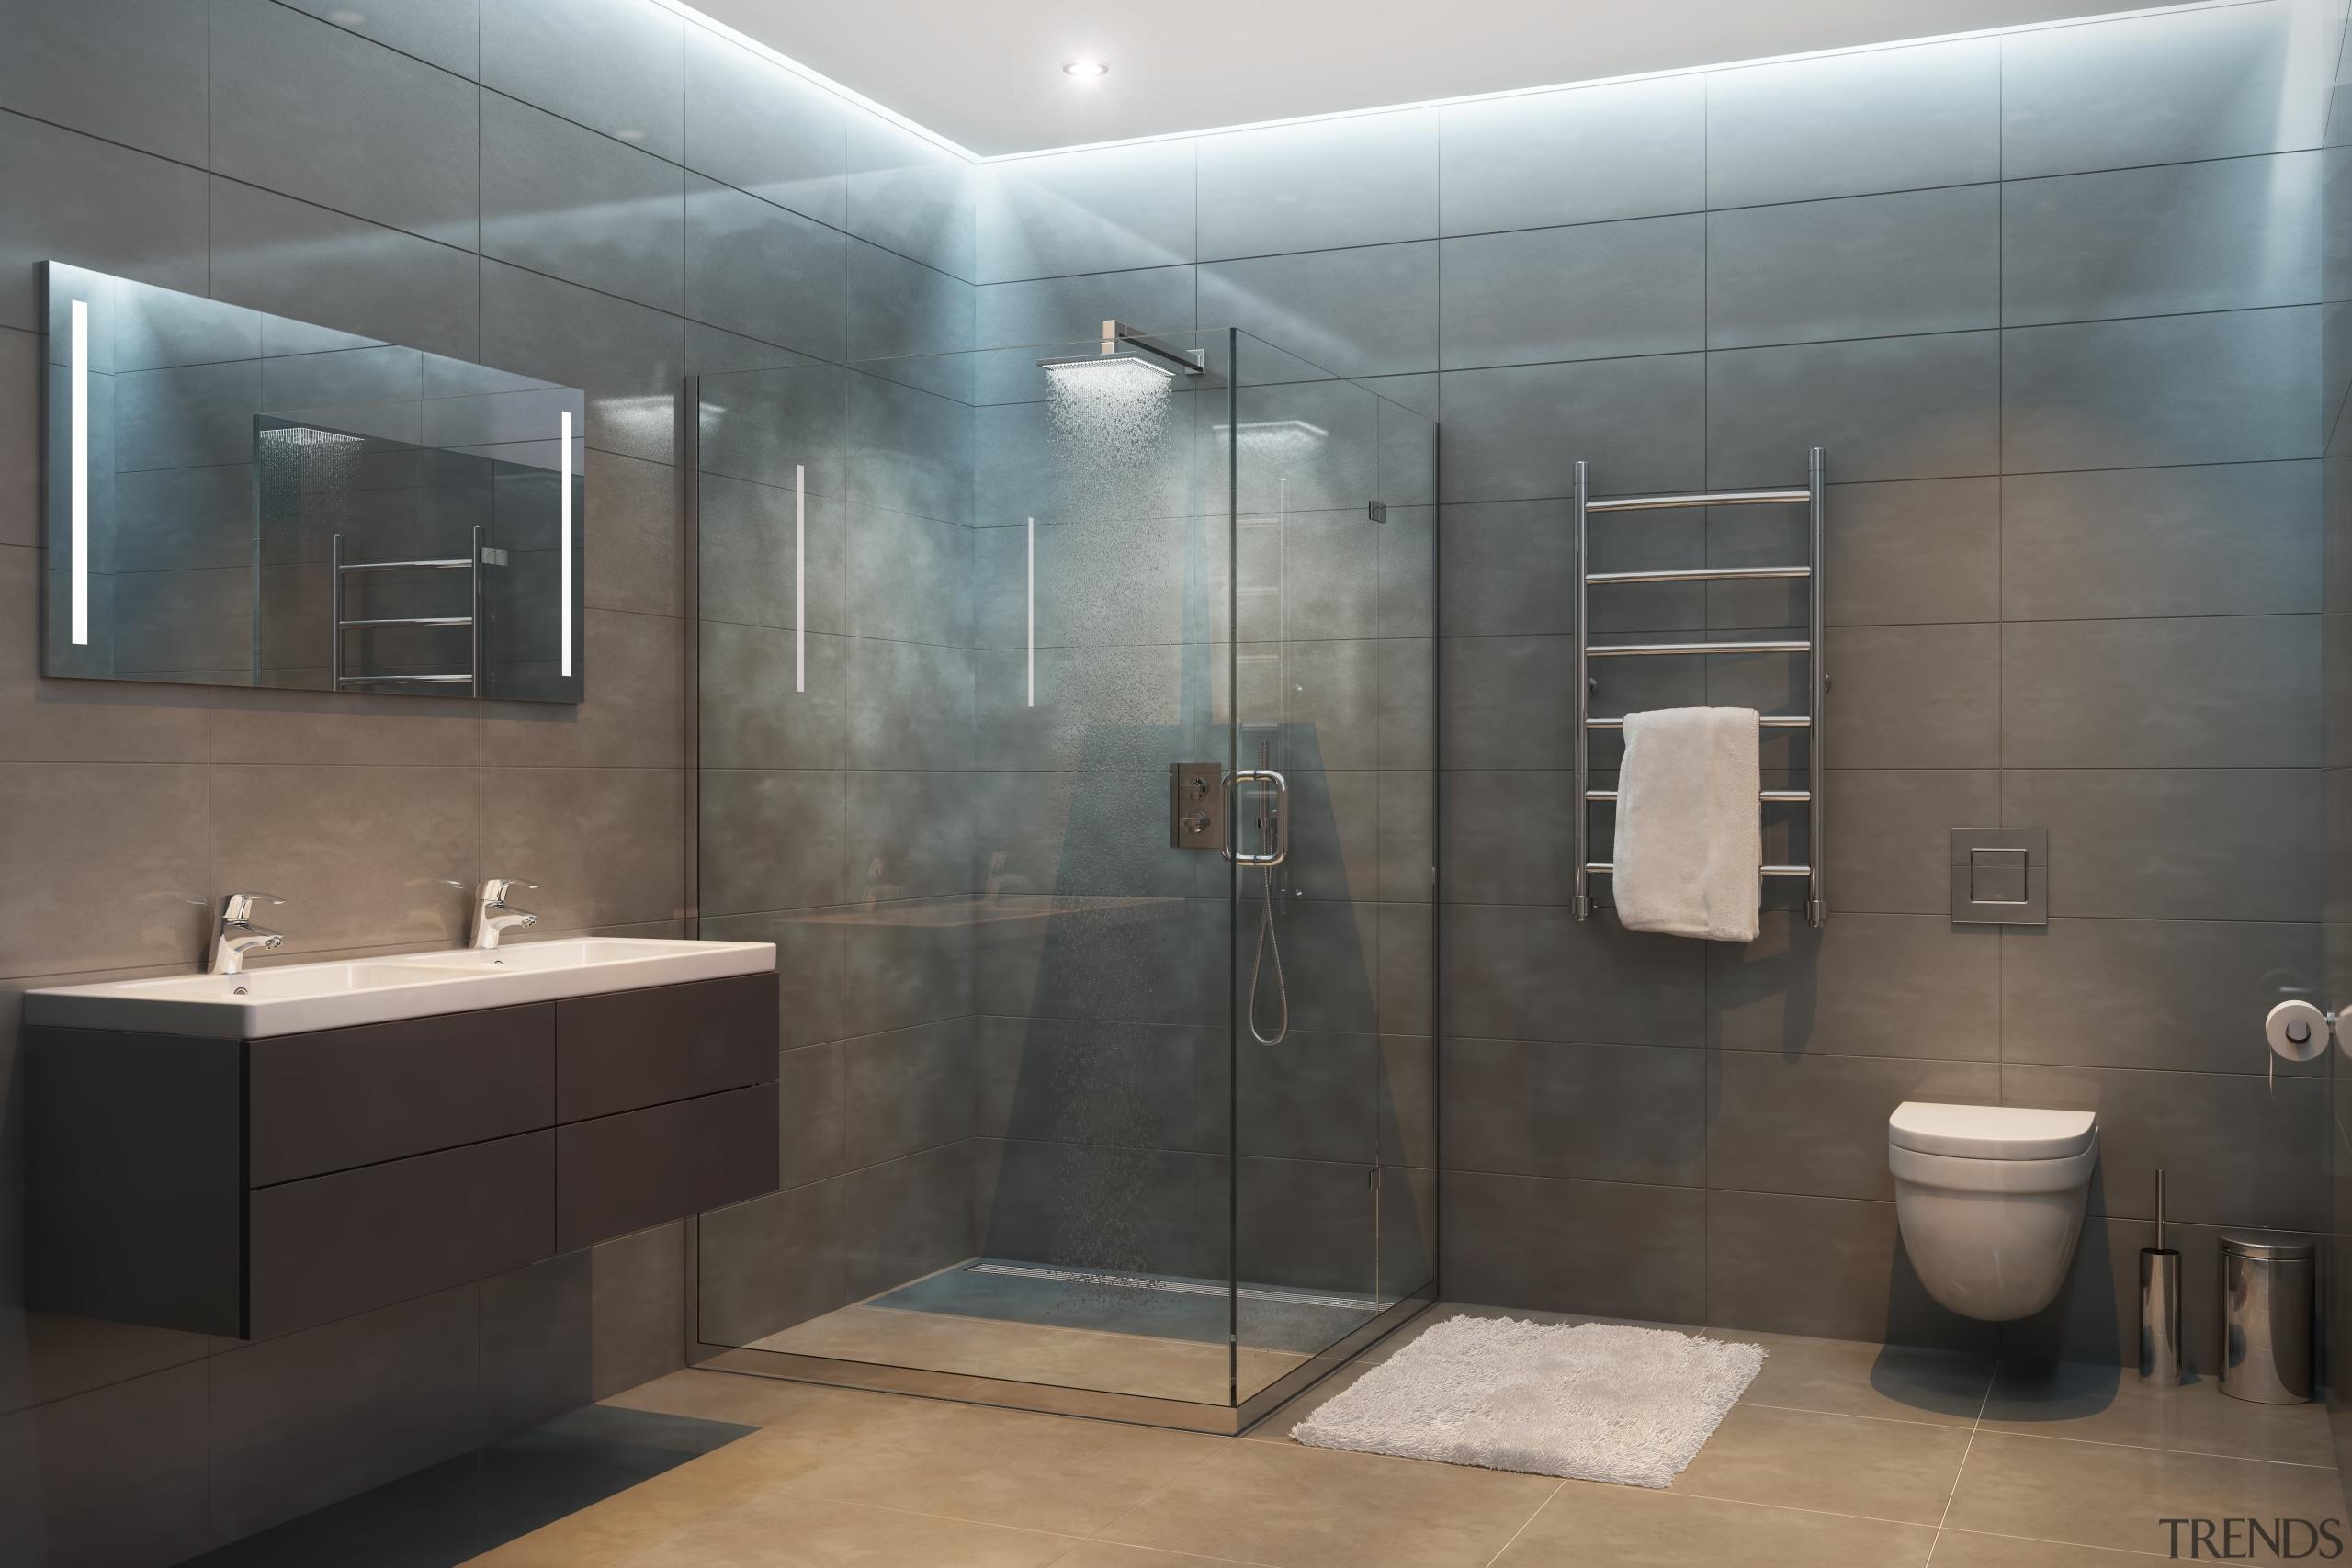 Adobestock 132932153 - bathroom | interior design | bathroom, interior design, plumbing fixture, room, gray, black